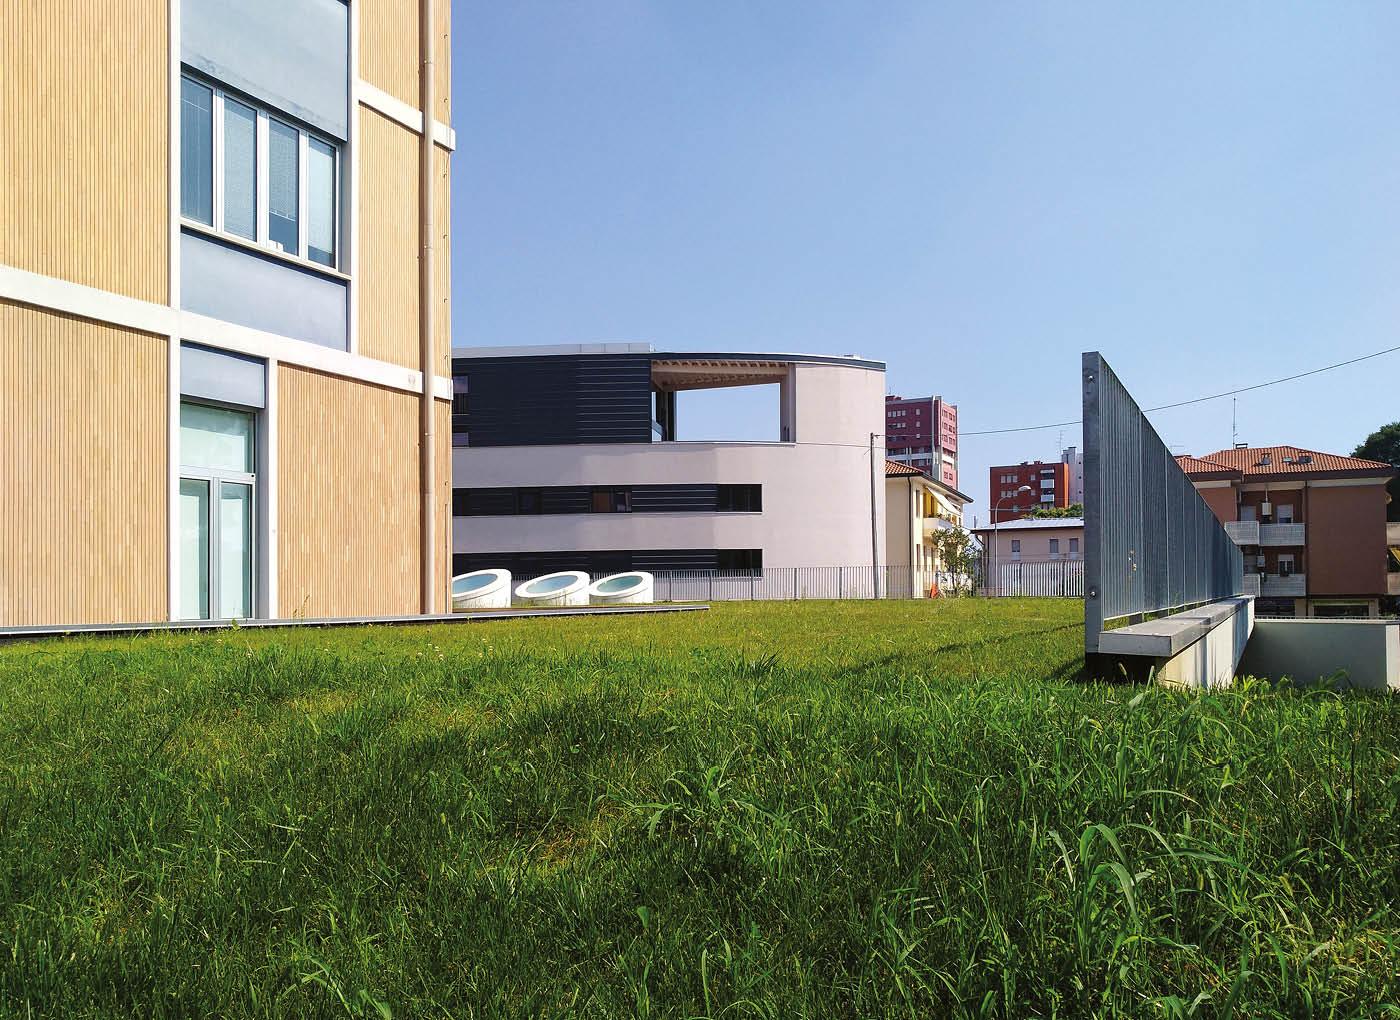 ospedale-pordenone-tetto-verde-lecagreen-4